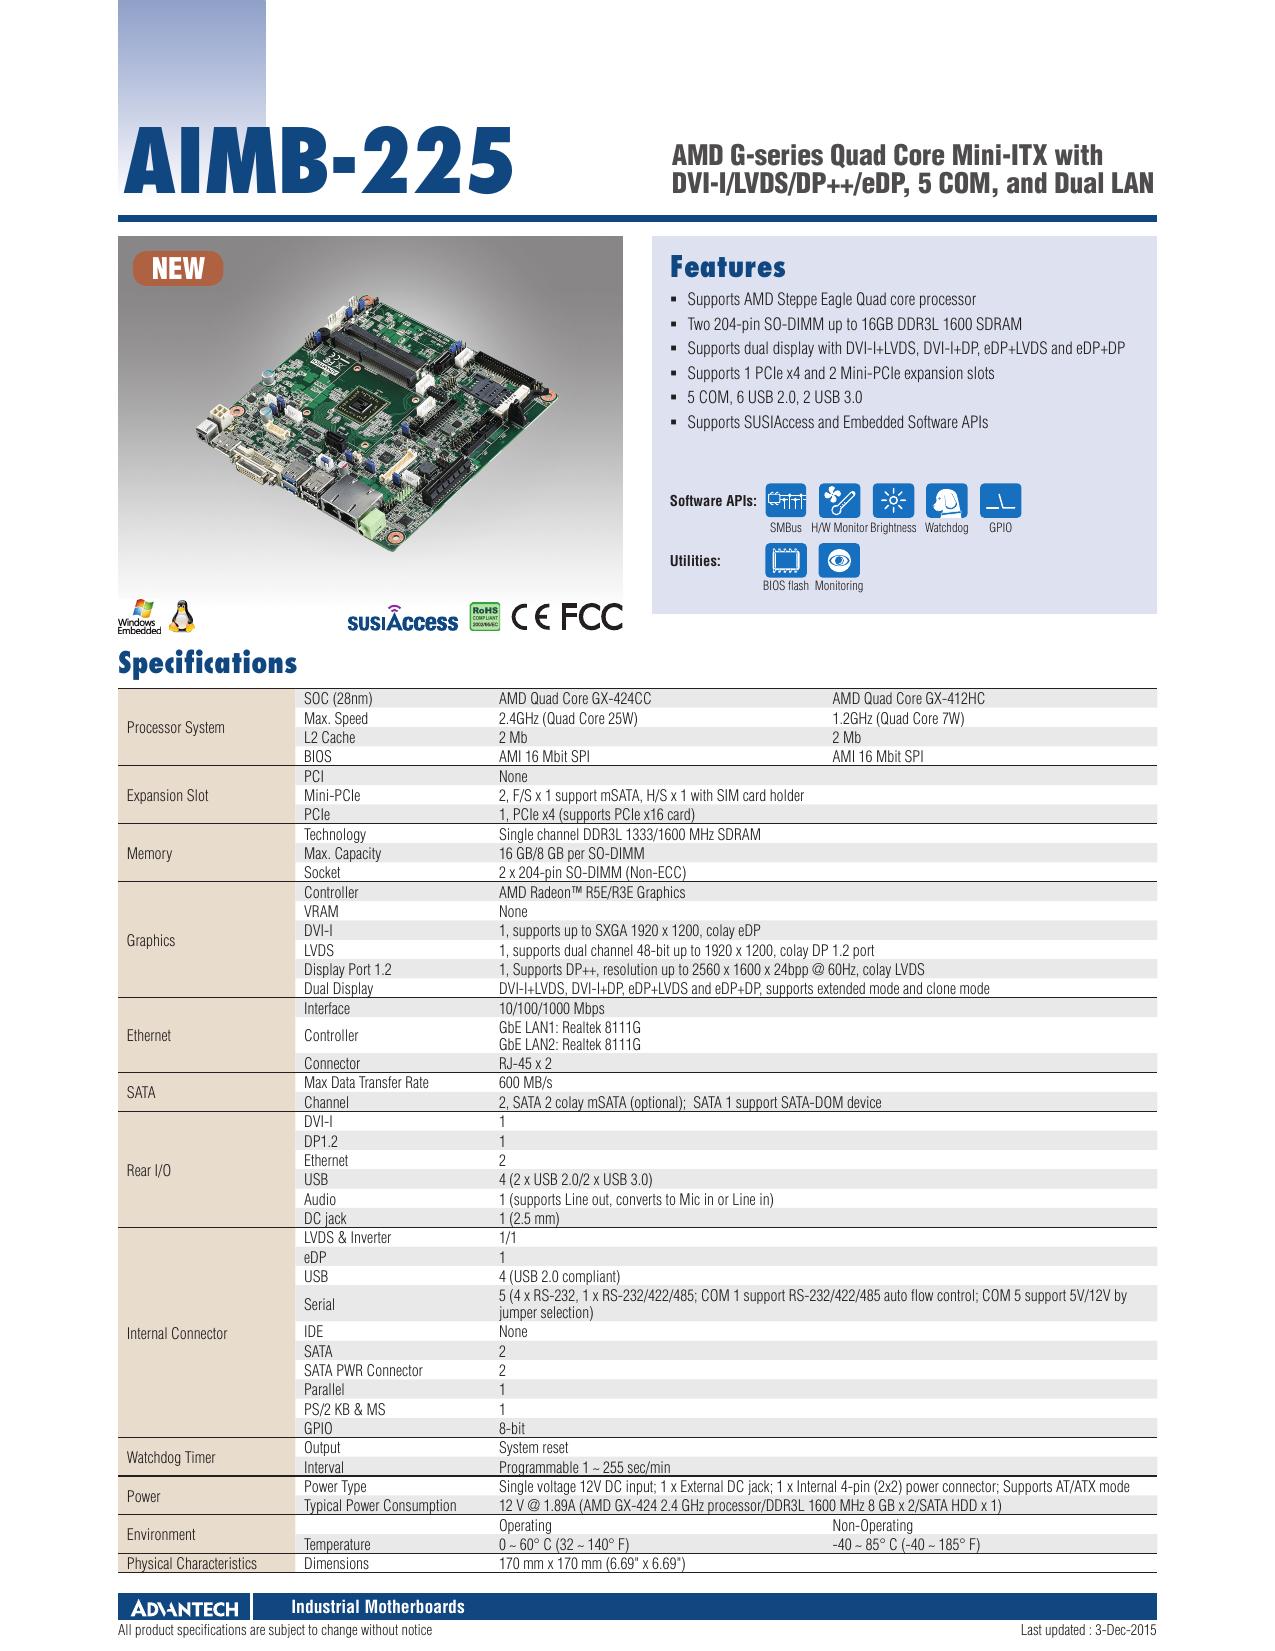 AIMB-225 - Advantech | manualzz com